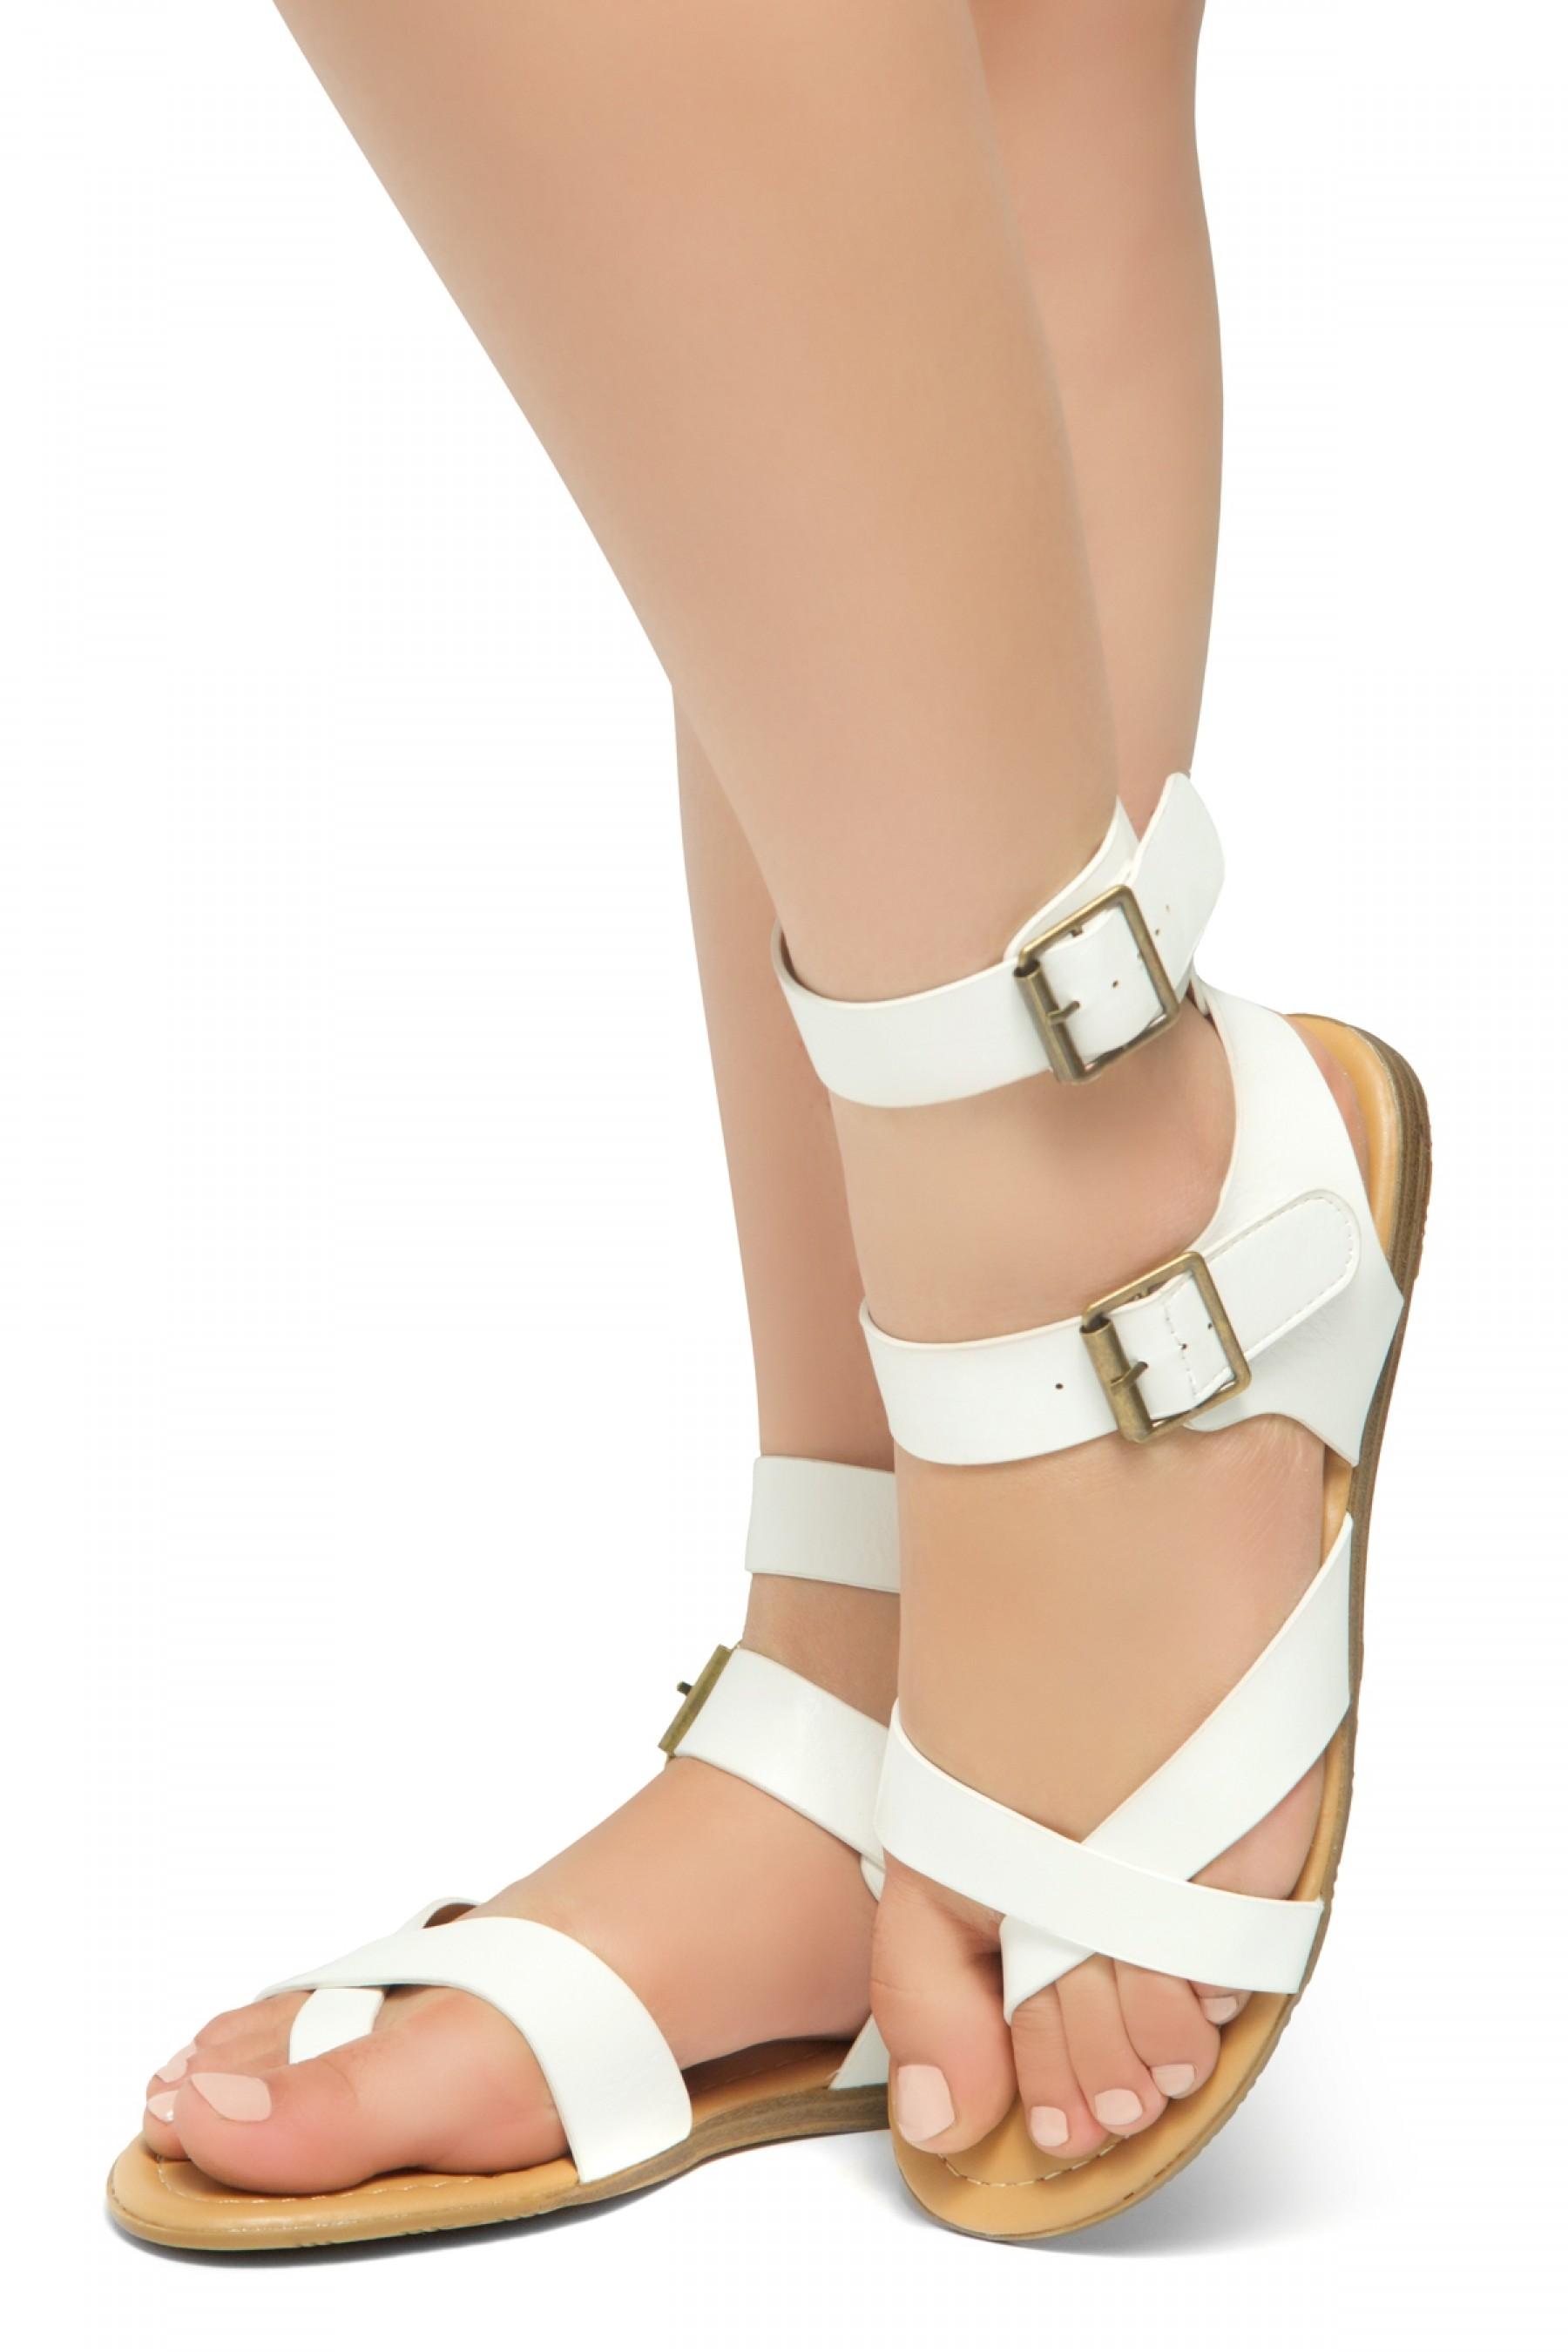 HerStyle Women's GABRIELLEH-Unique Simplistic Crisscross Straps Vamp with Dual Buckles Sandals (White)